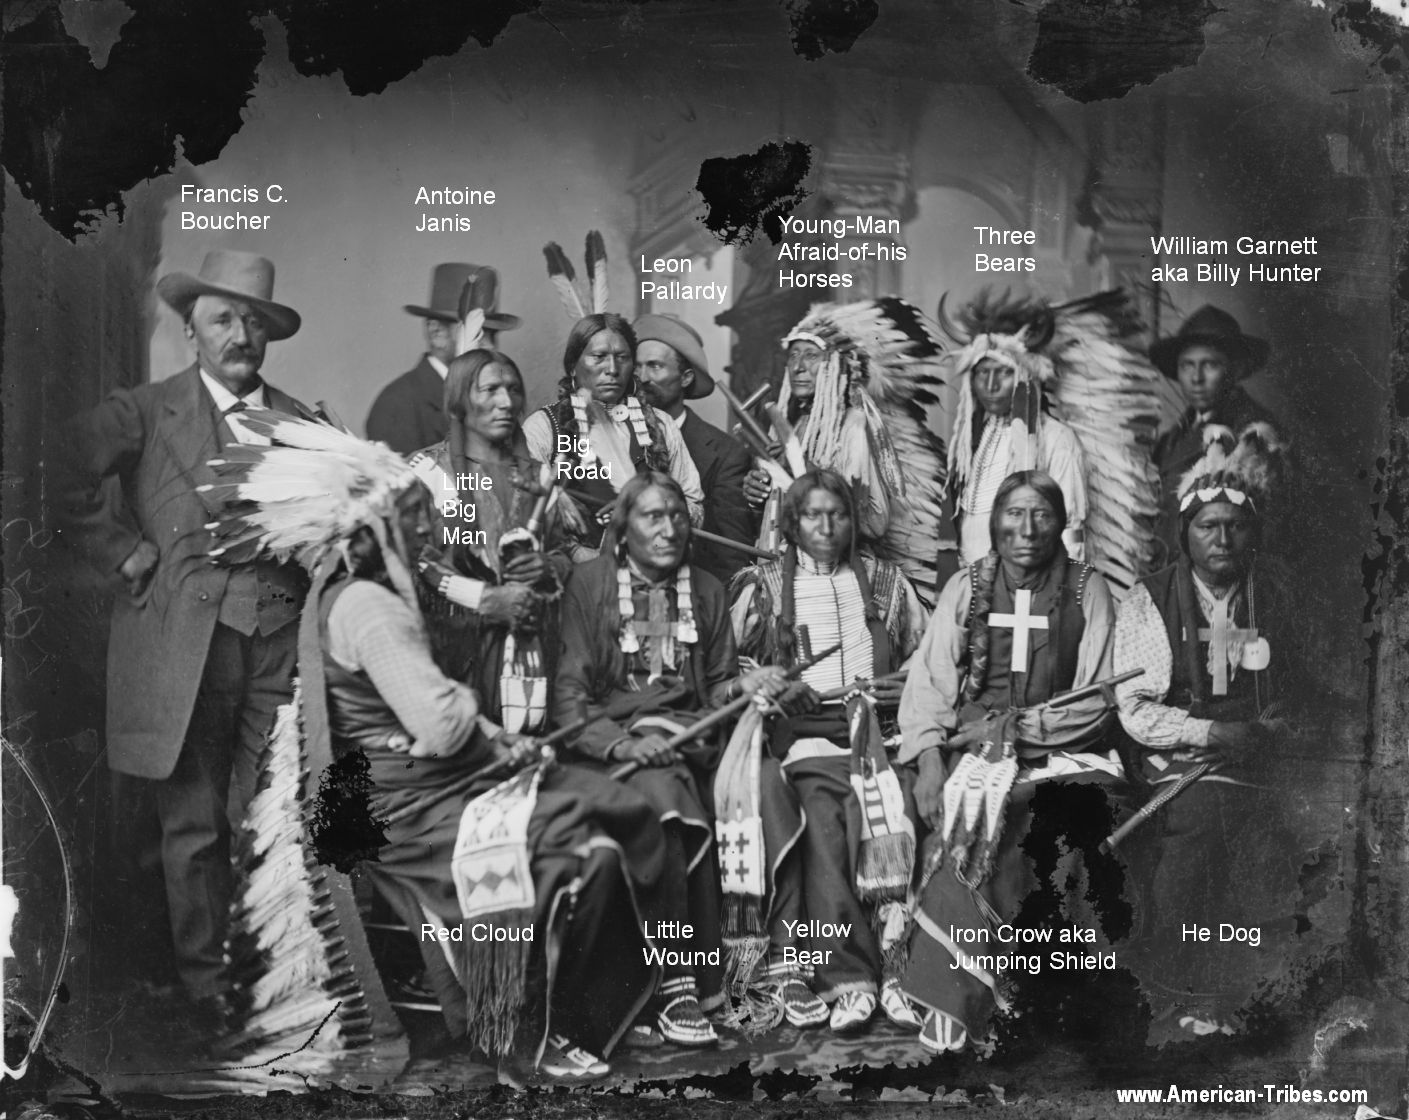 http://www.american-tribes.com/messageboards/dietmar/delegation1877a.jpg